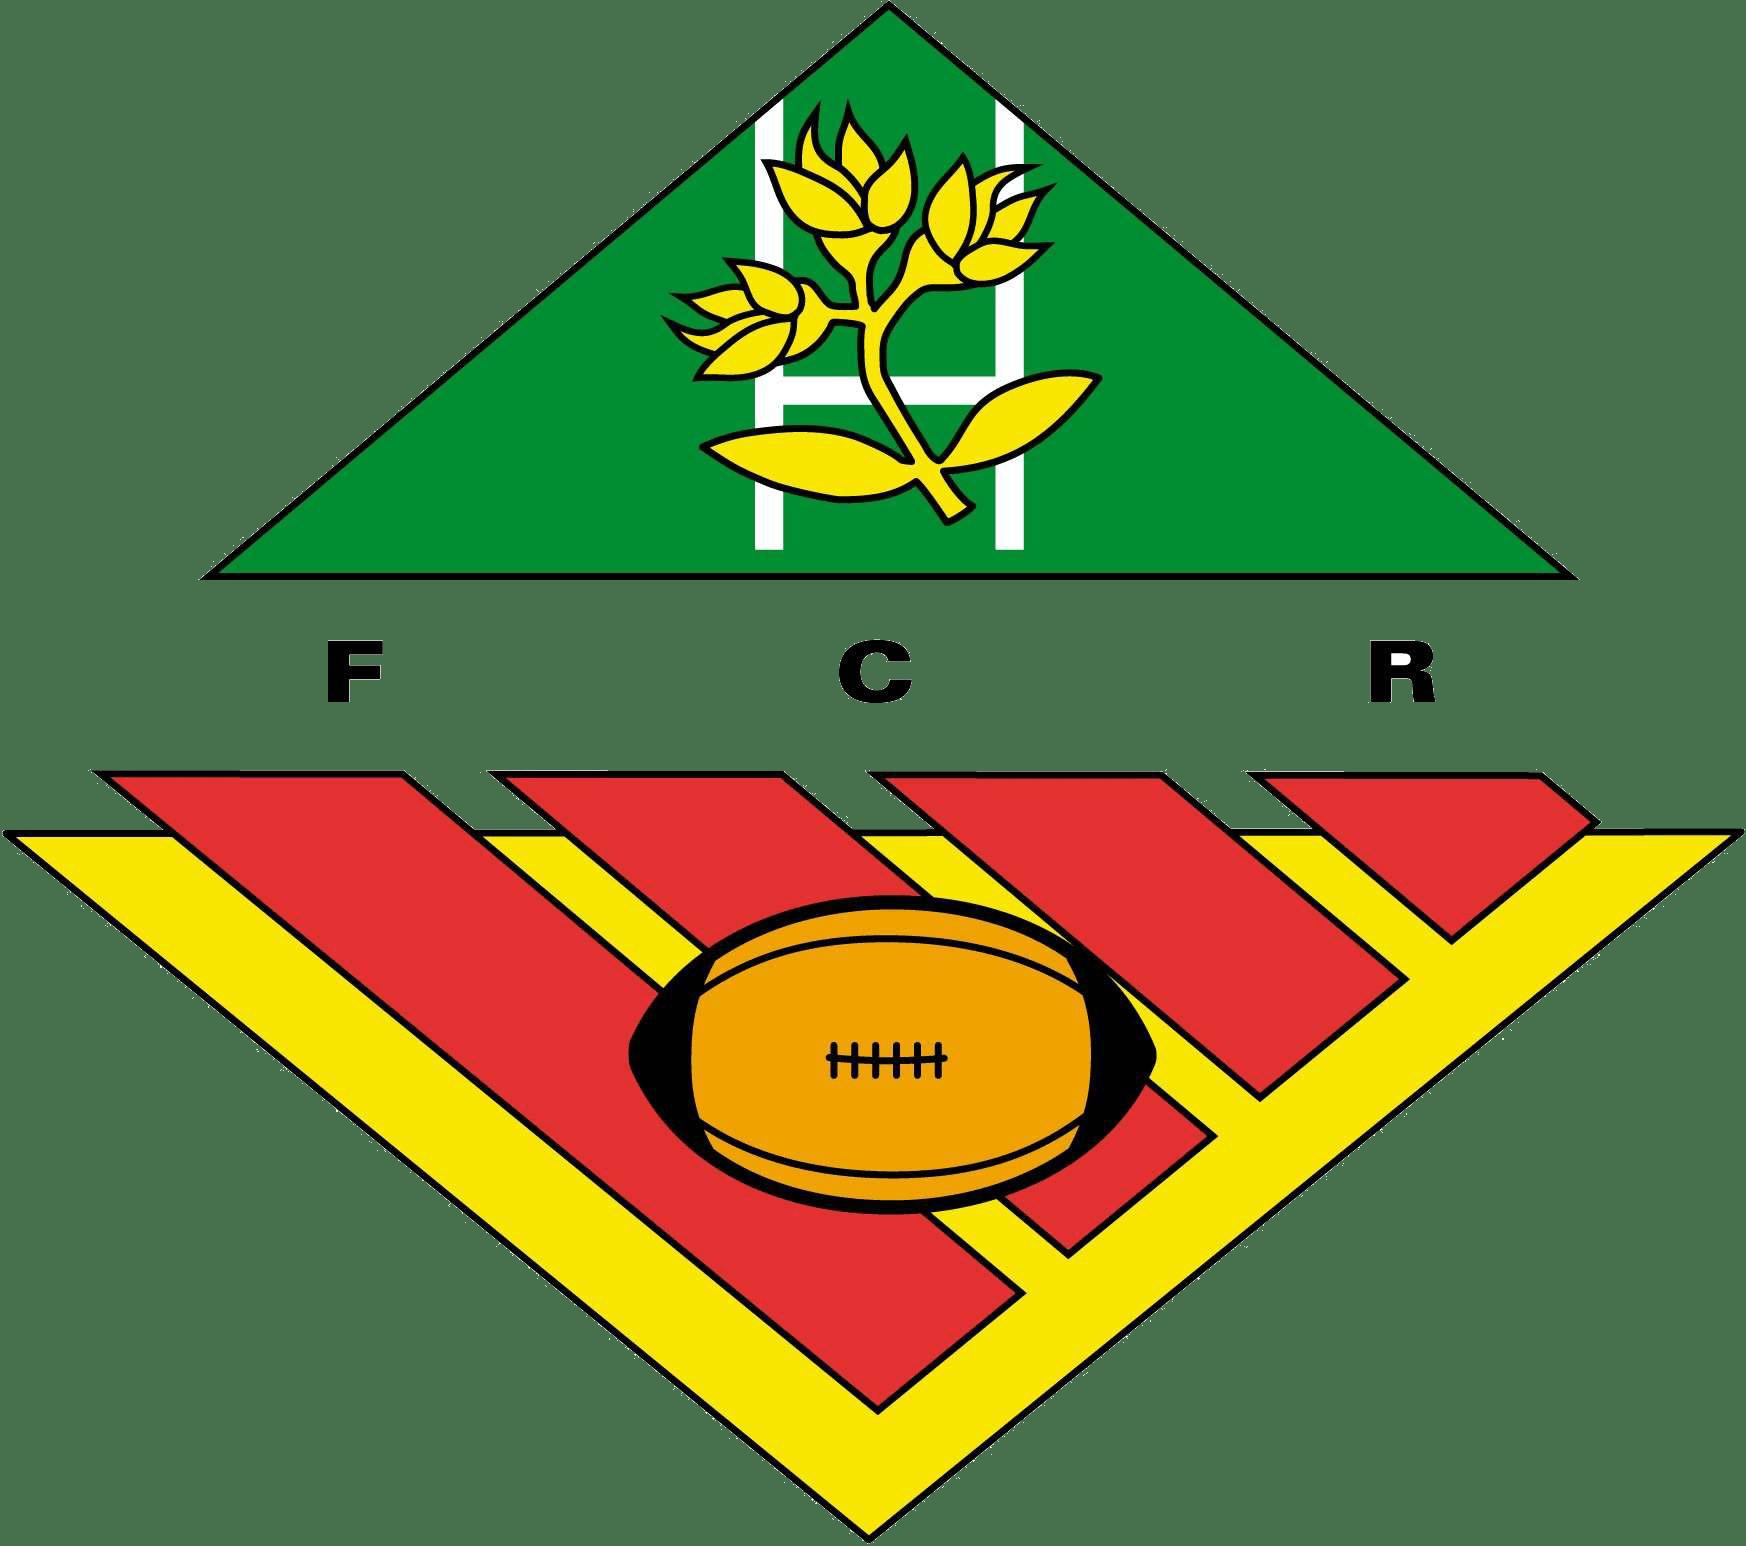 logo fed cat rugby